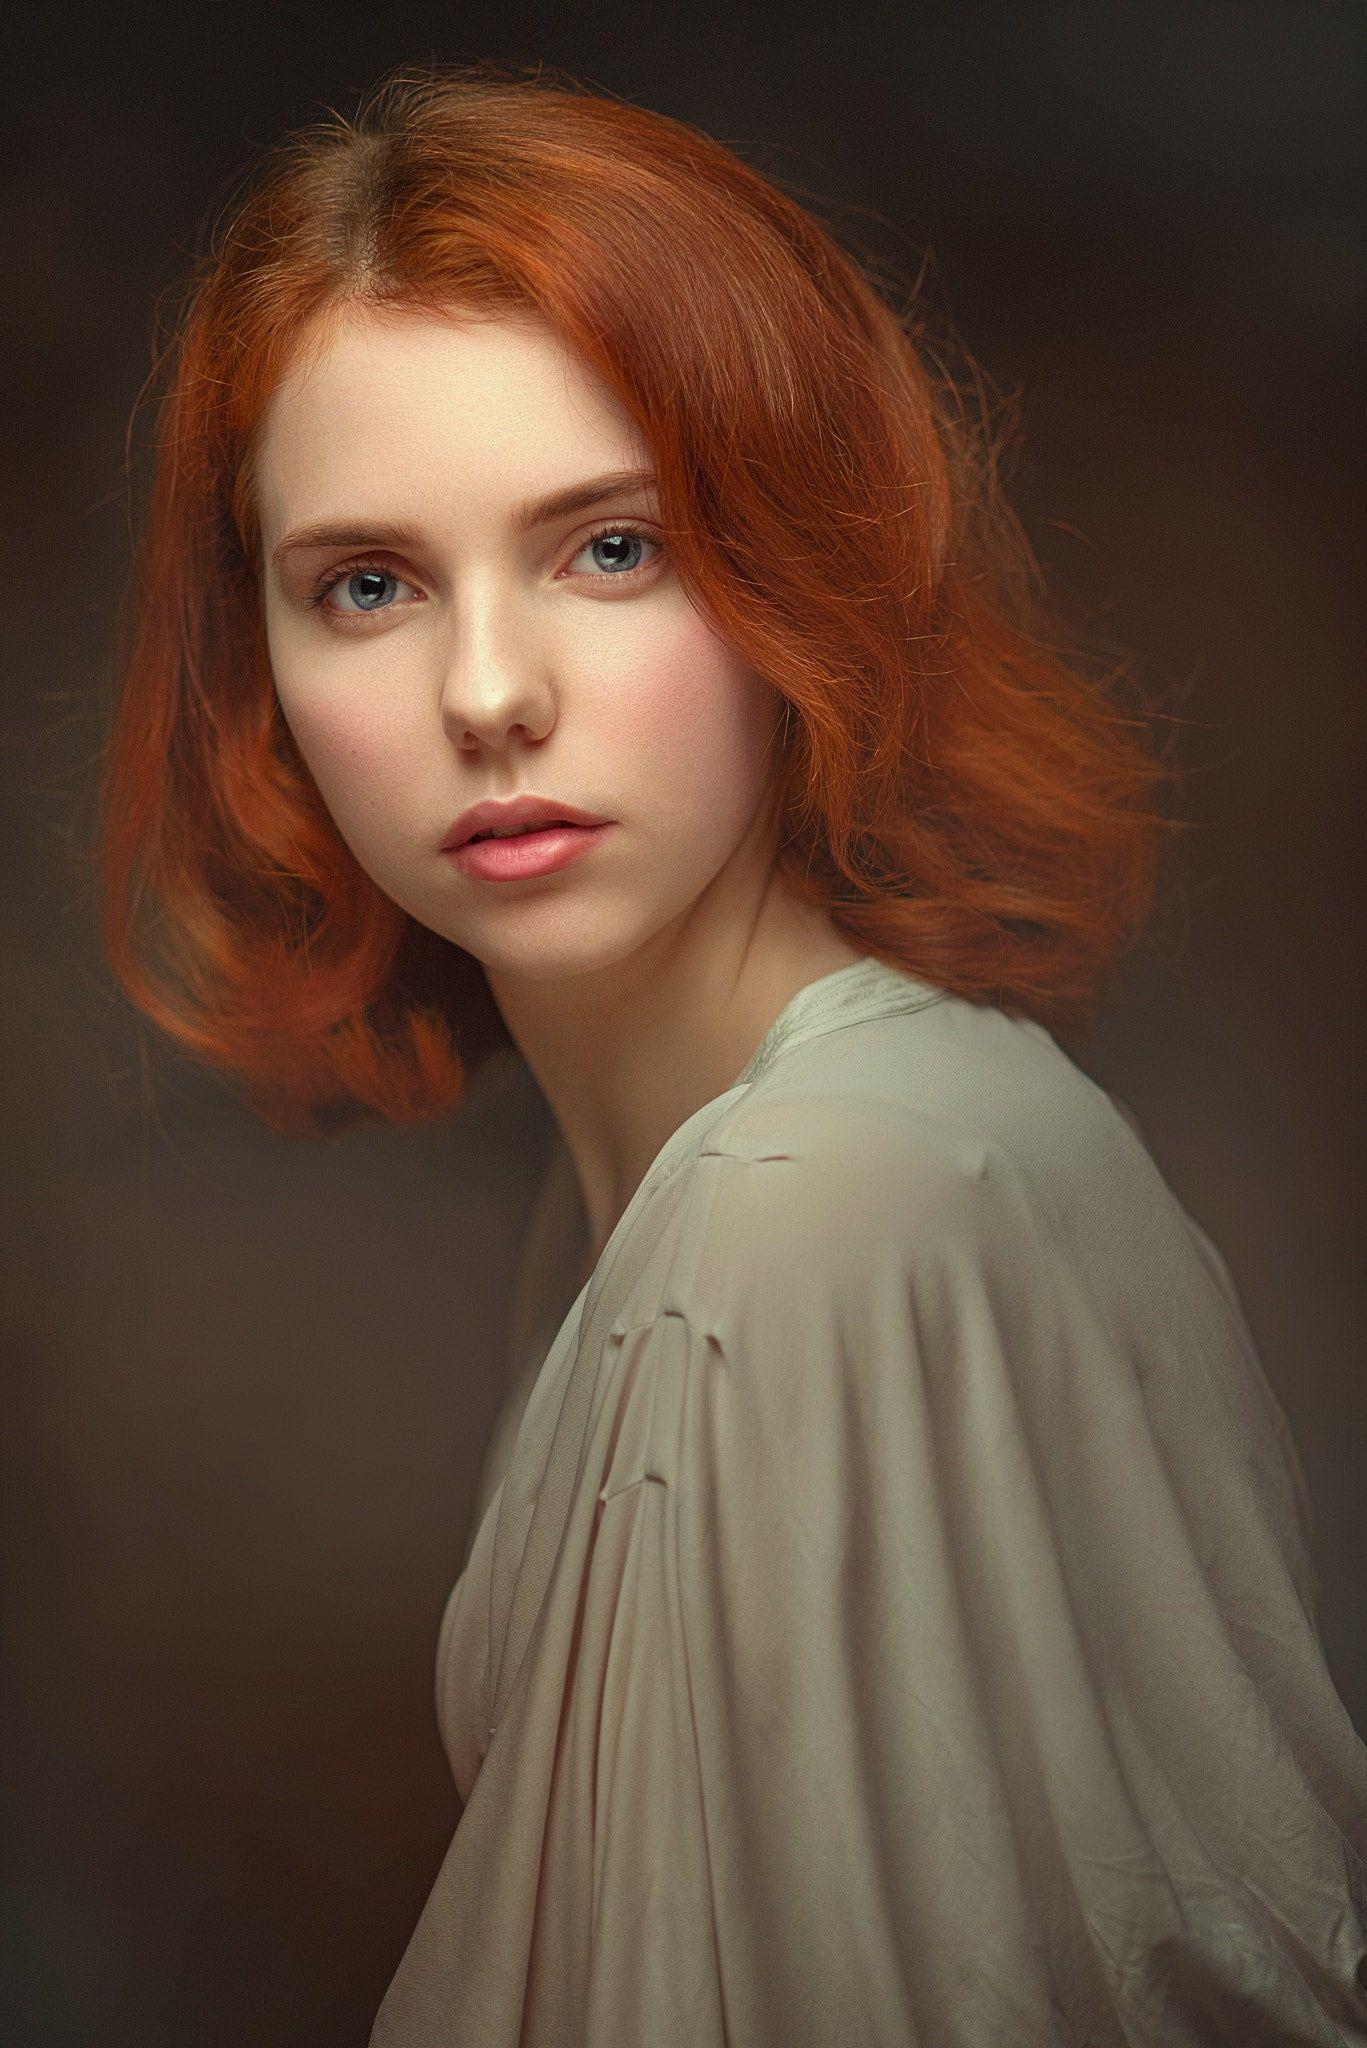 Redhead - HD Naked Girls